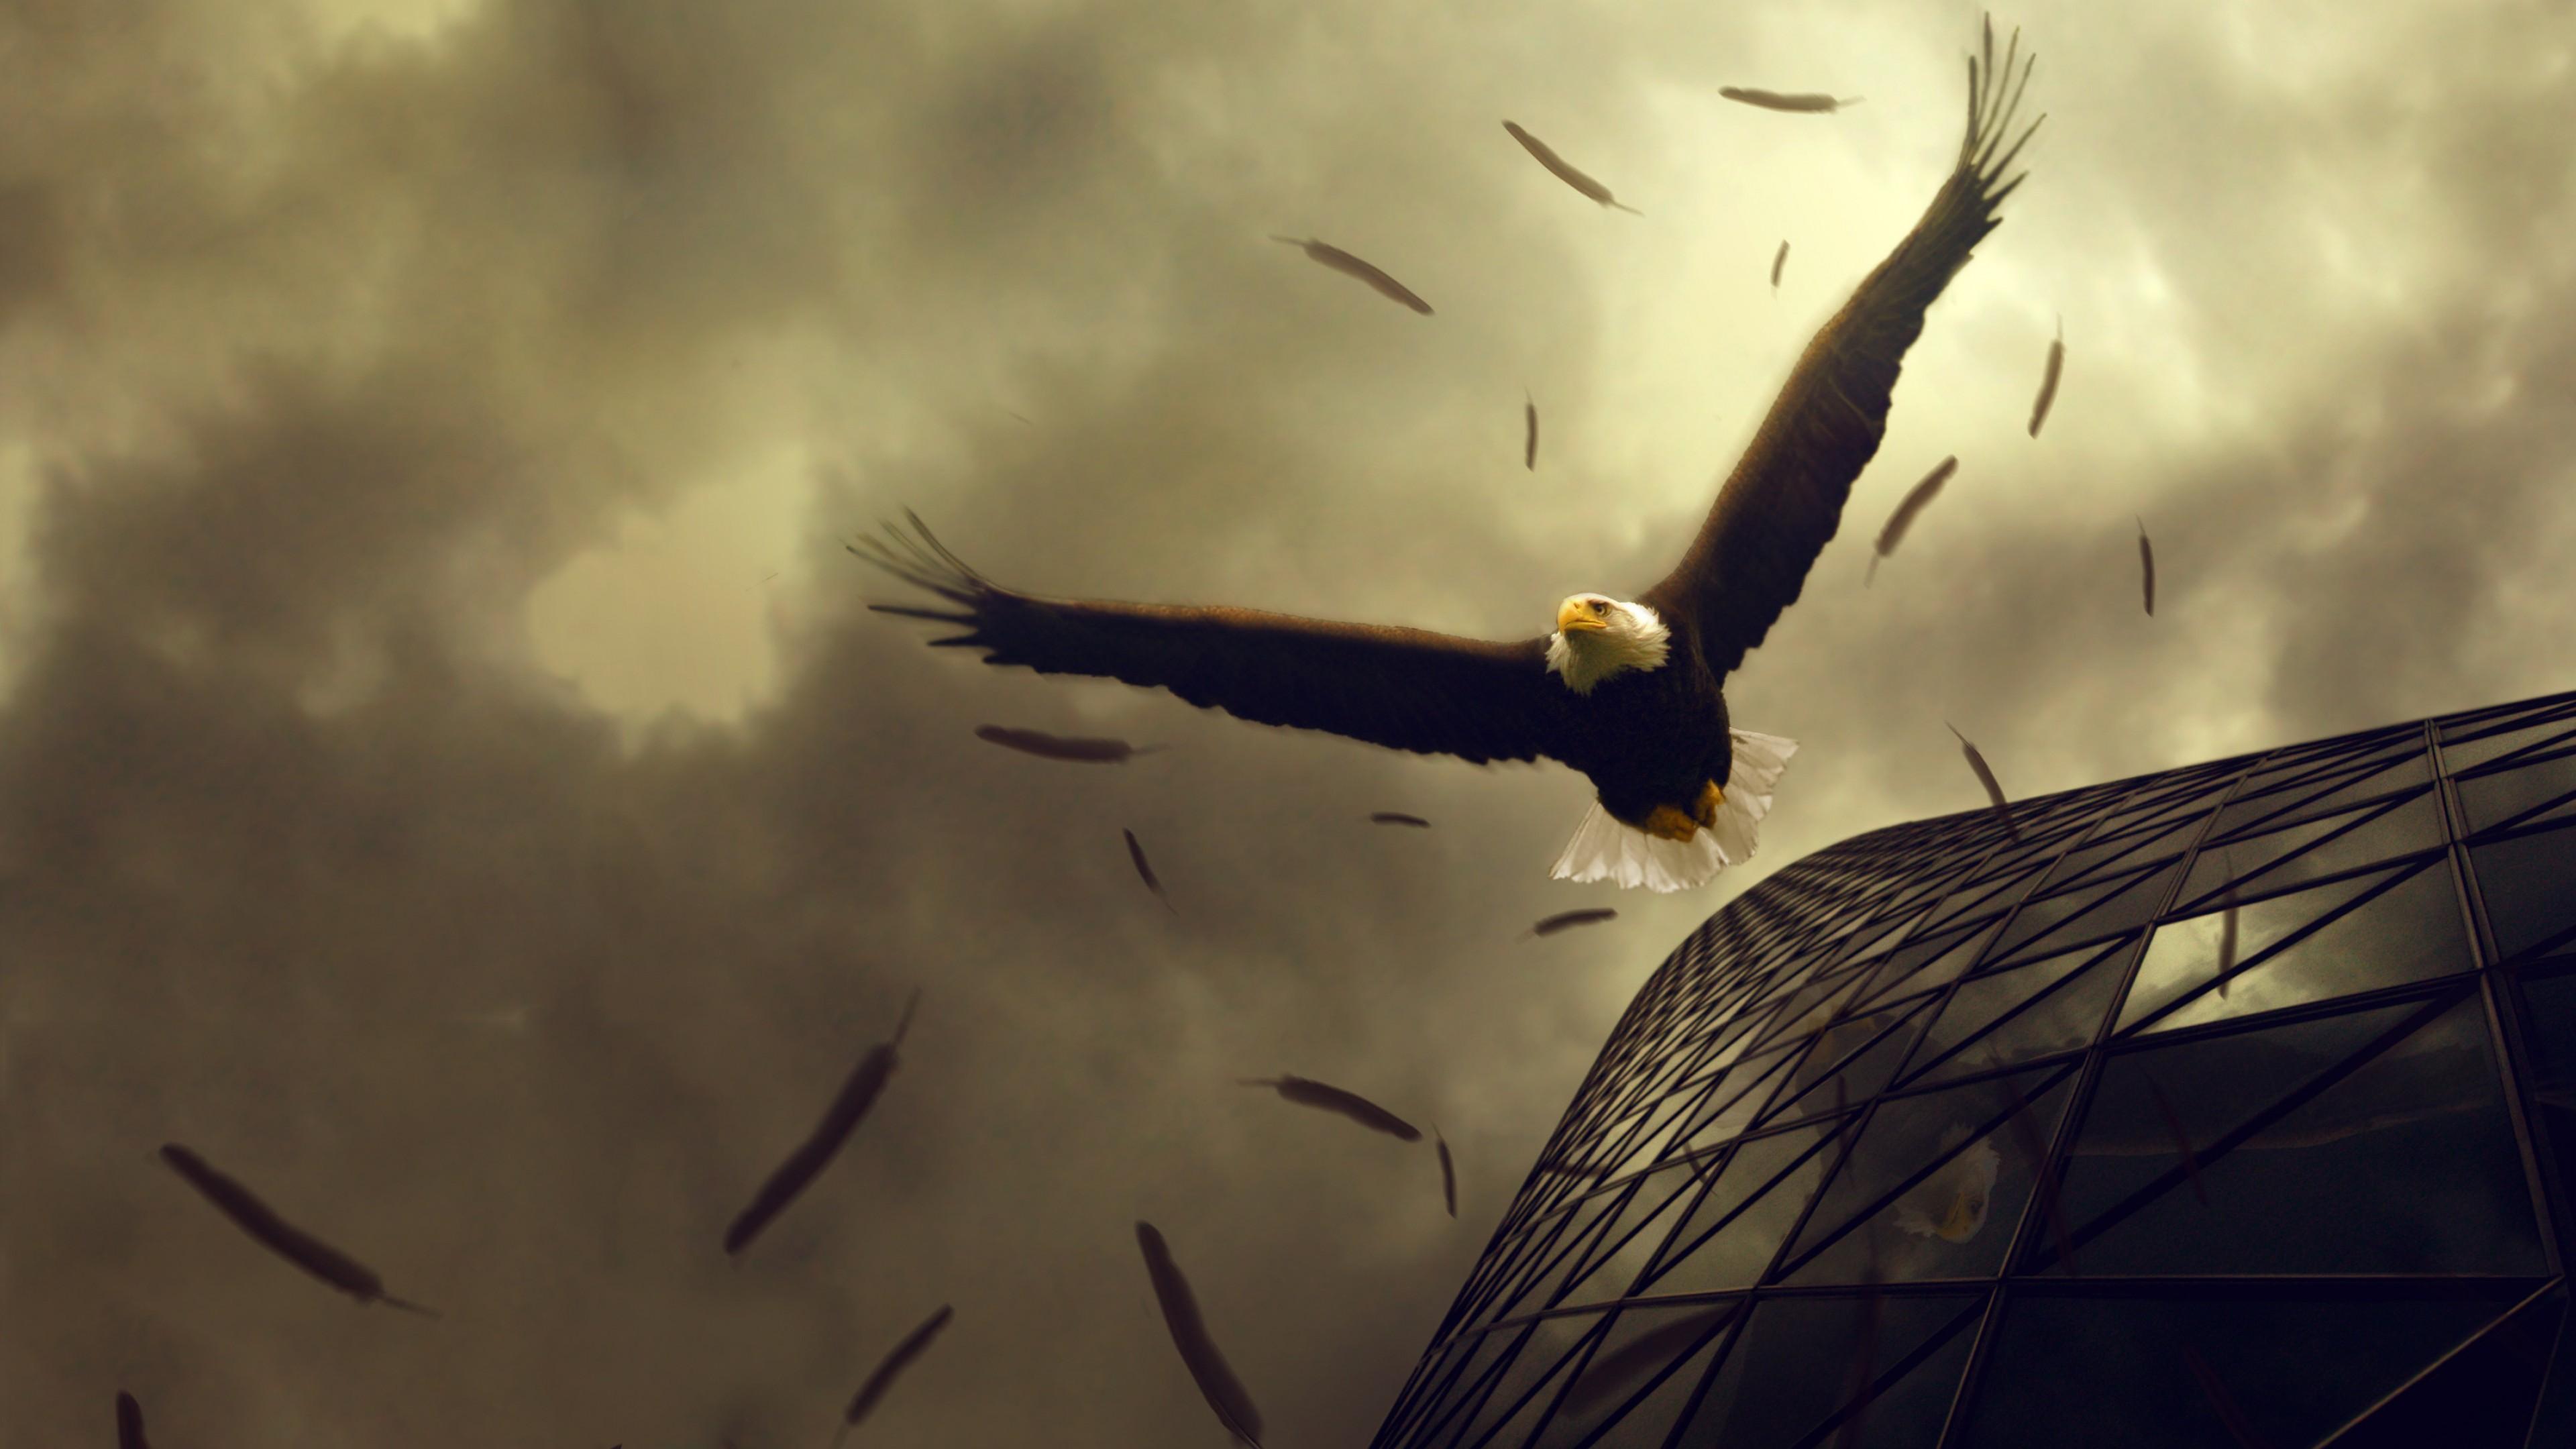 Wallpaper Eagle, 4k, HD wallpaper, sky, clouds, building ...